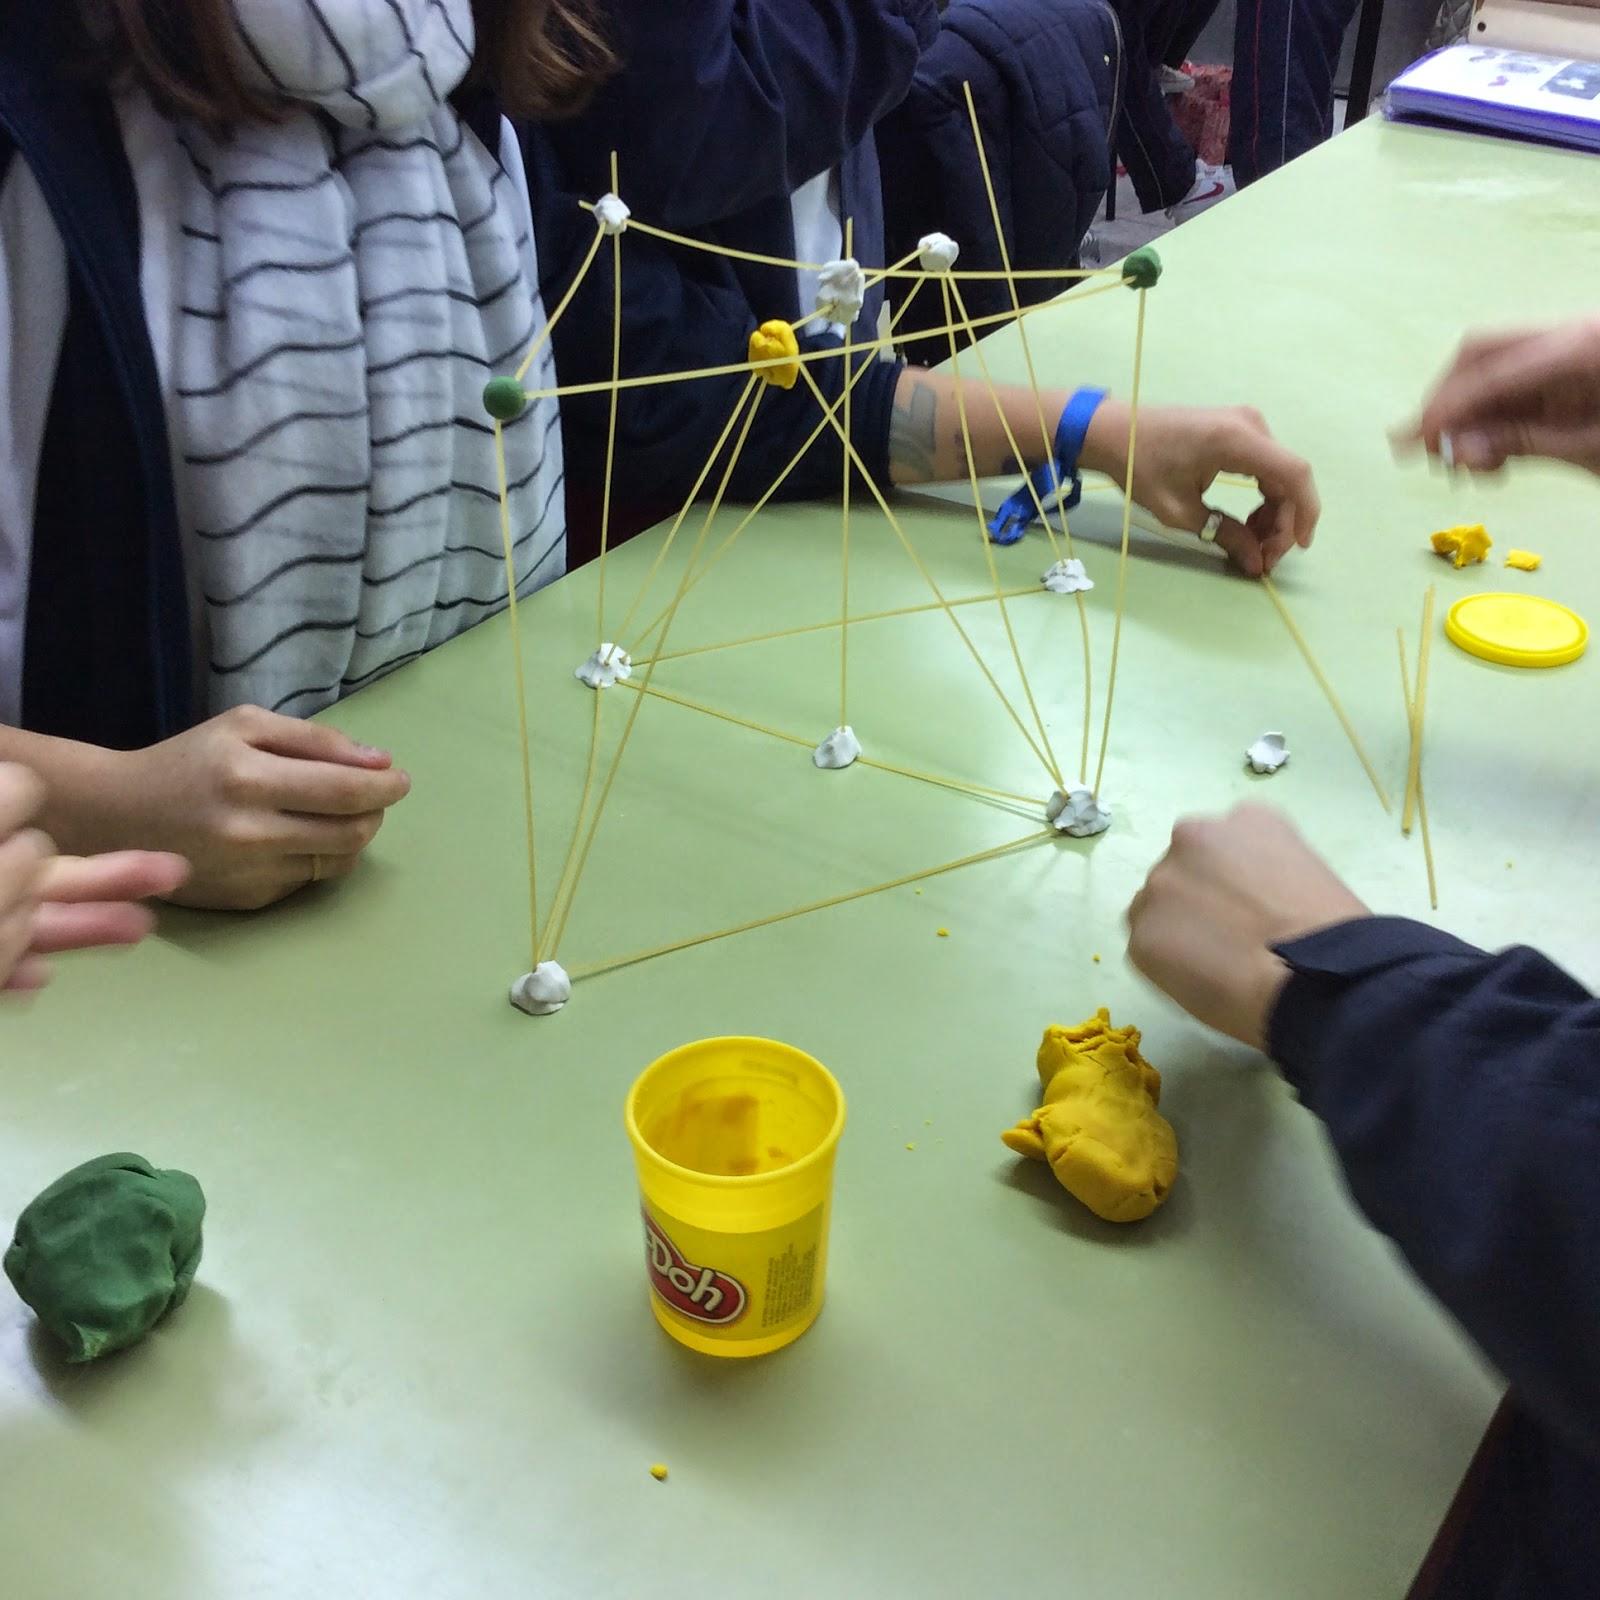 Estructuras de espaghetis Tecnología